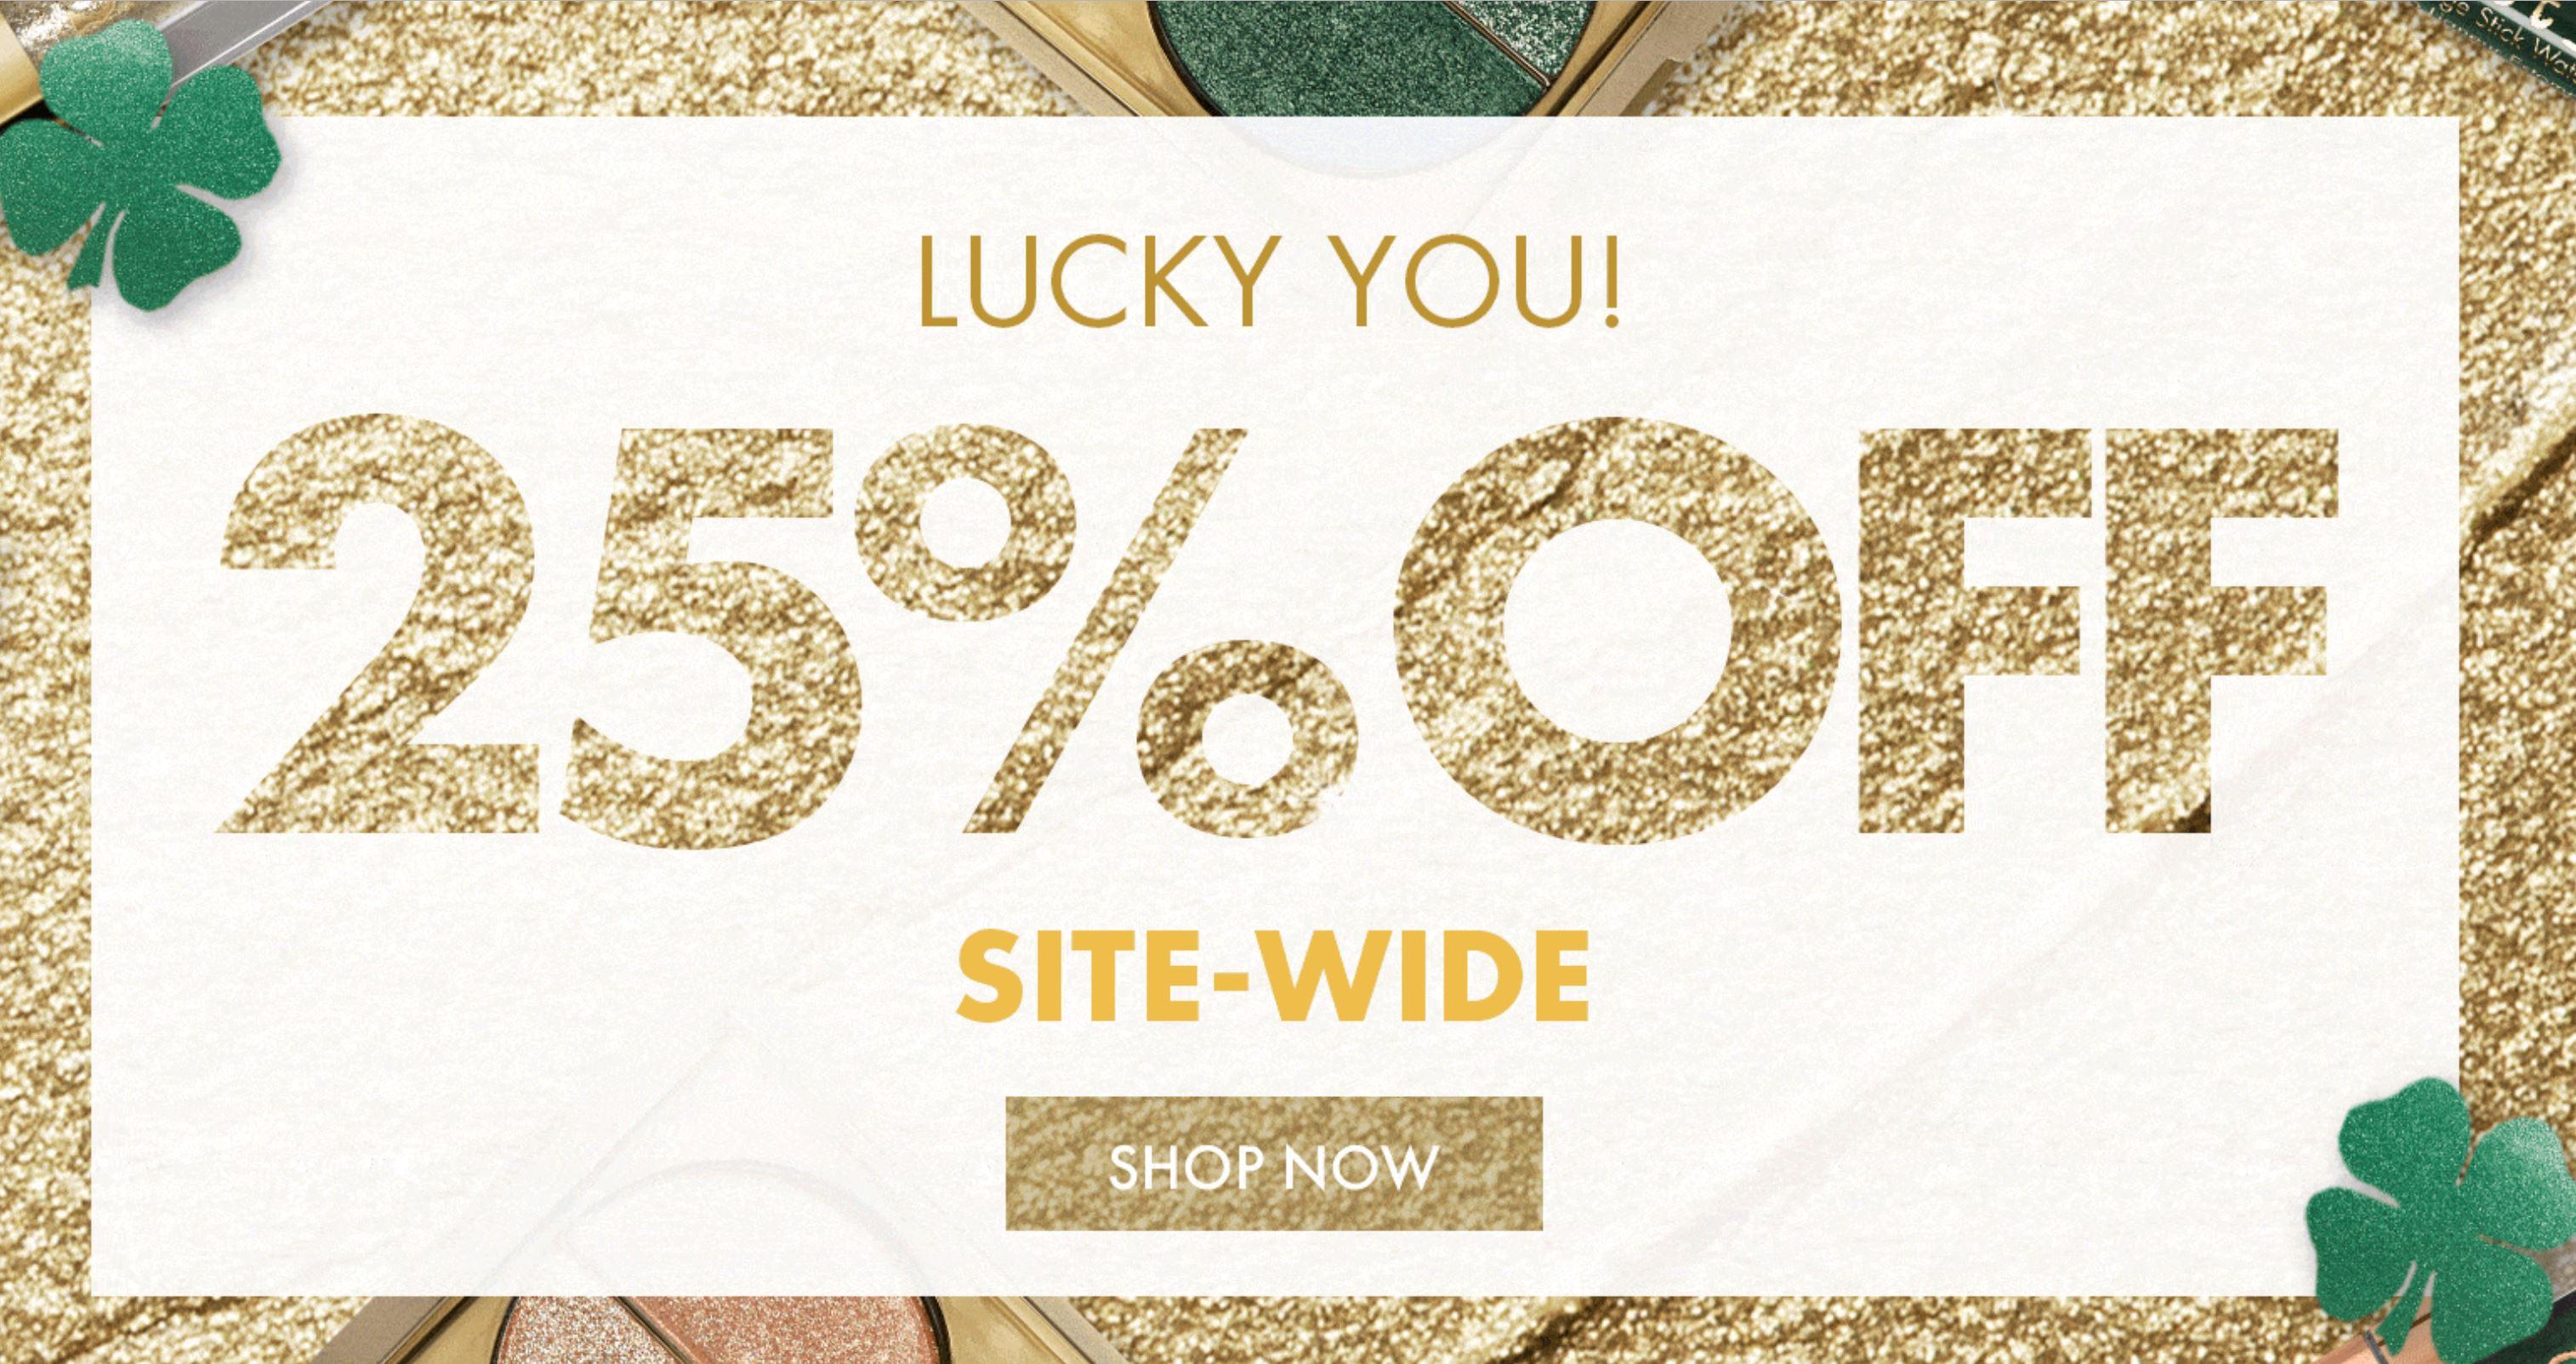 ad67b51ecc70 Stila  25% Off Sitewide - Slickdeals.net